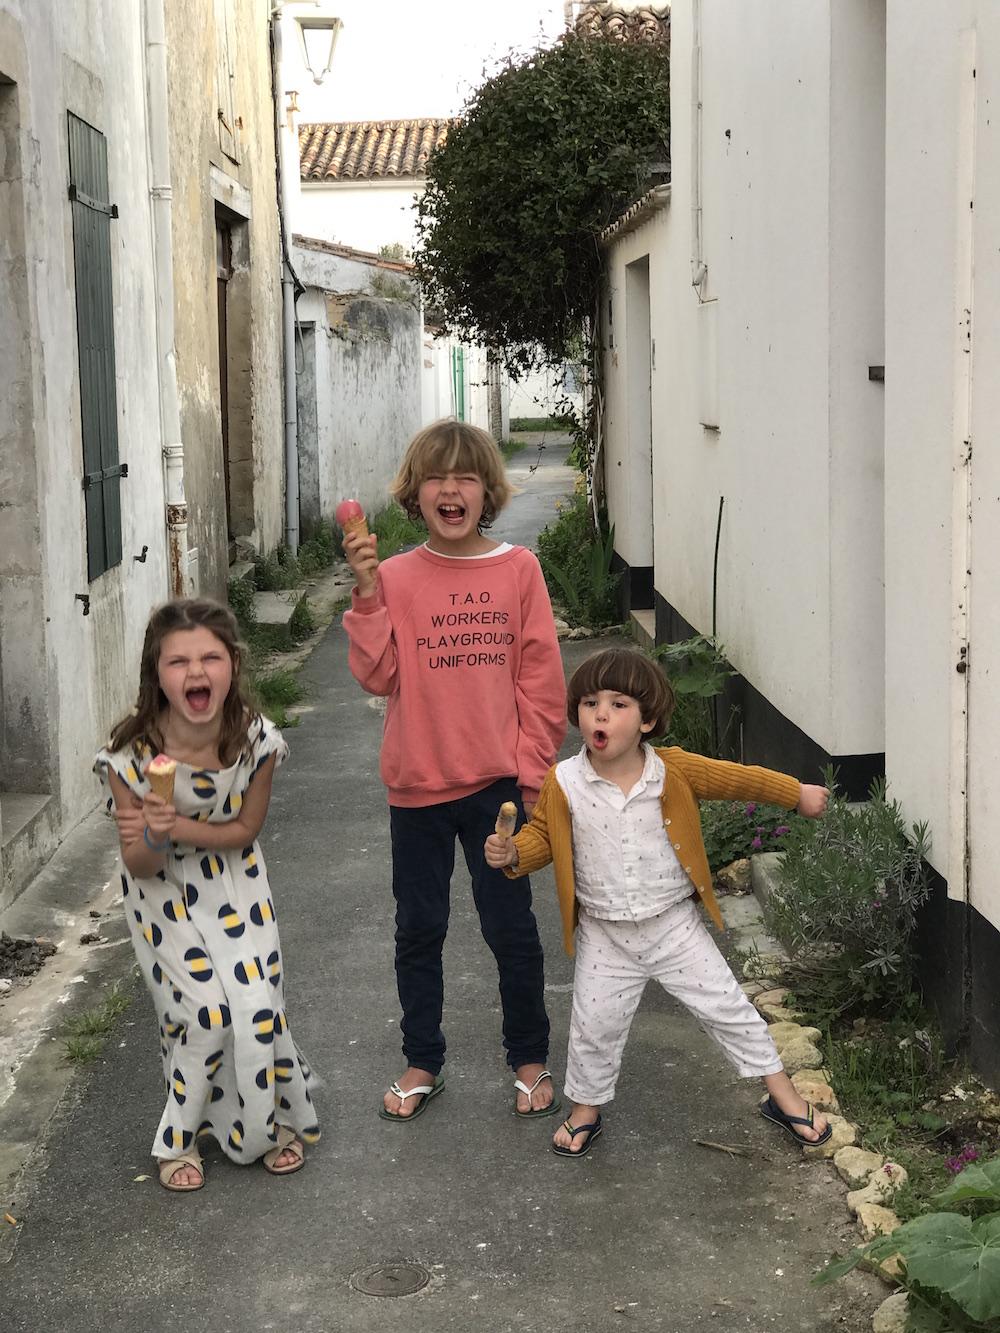 Petit Bec, Olive maman poule de 3 bambins - Blog famille Sunday Grenadine